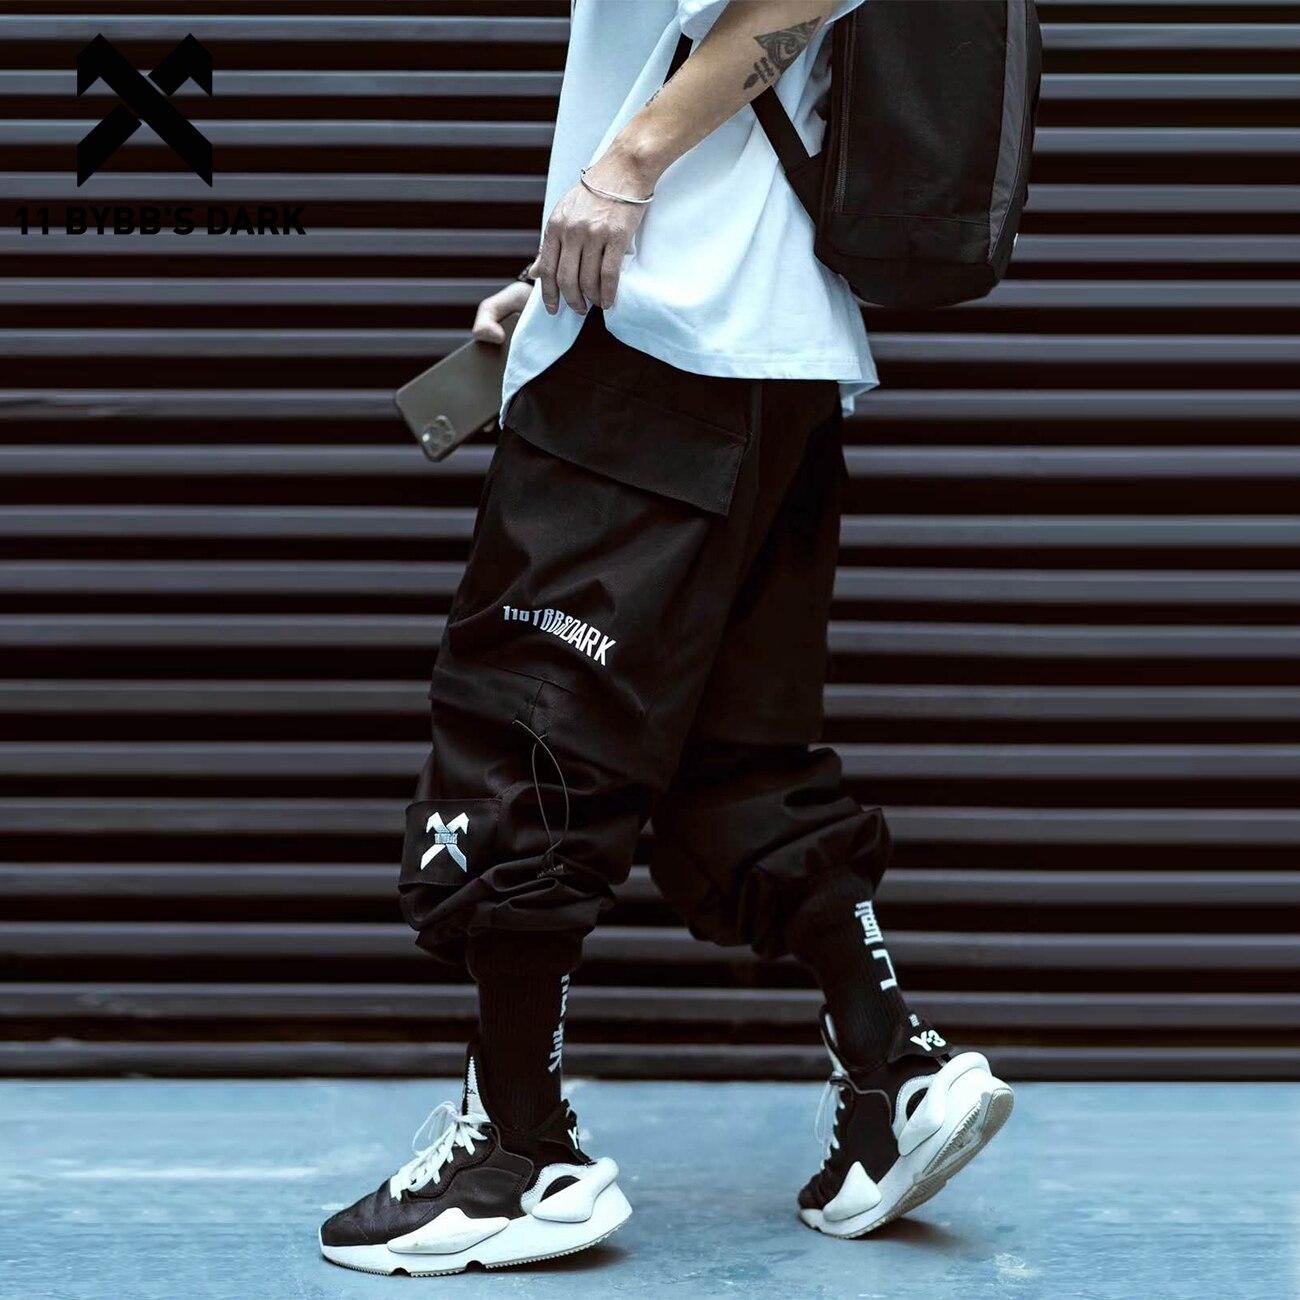 11 BYBB'S DARK Tatical Casual Pants 2020 Removable Streetwear Joggers Men Trousers Hip Hop Harajuku Cargo Shorts Pants Techwear